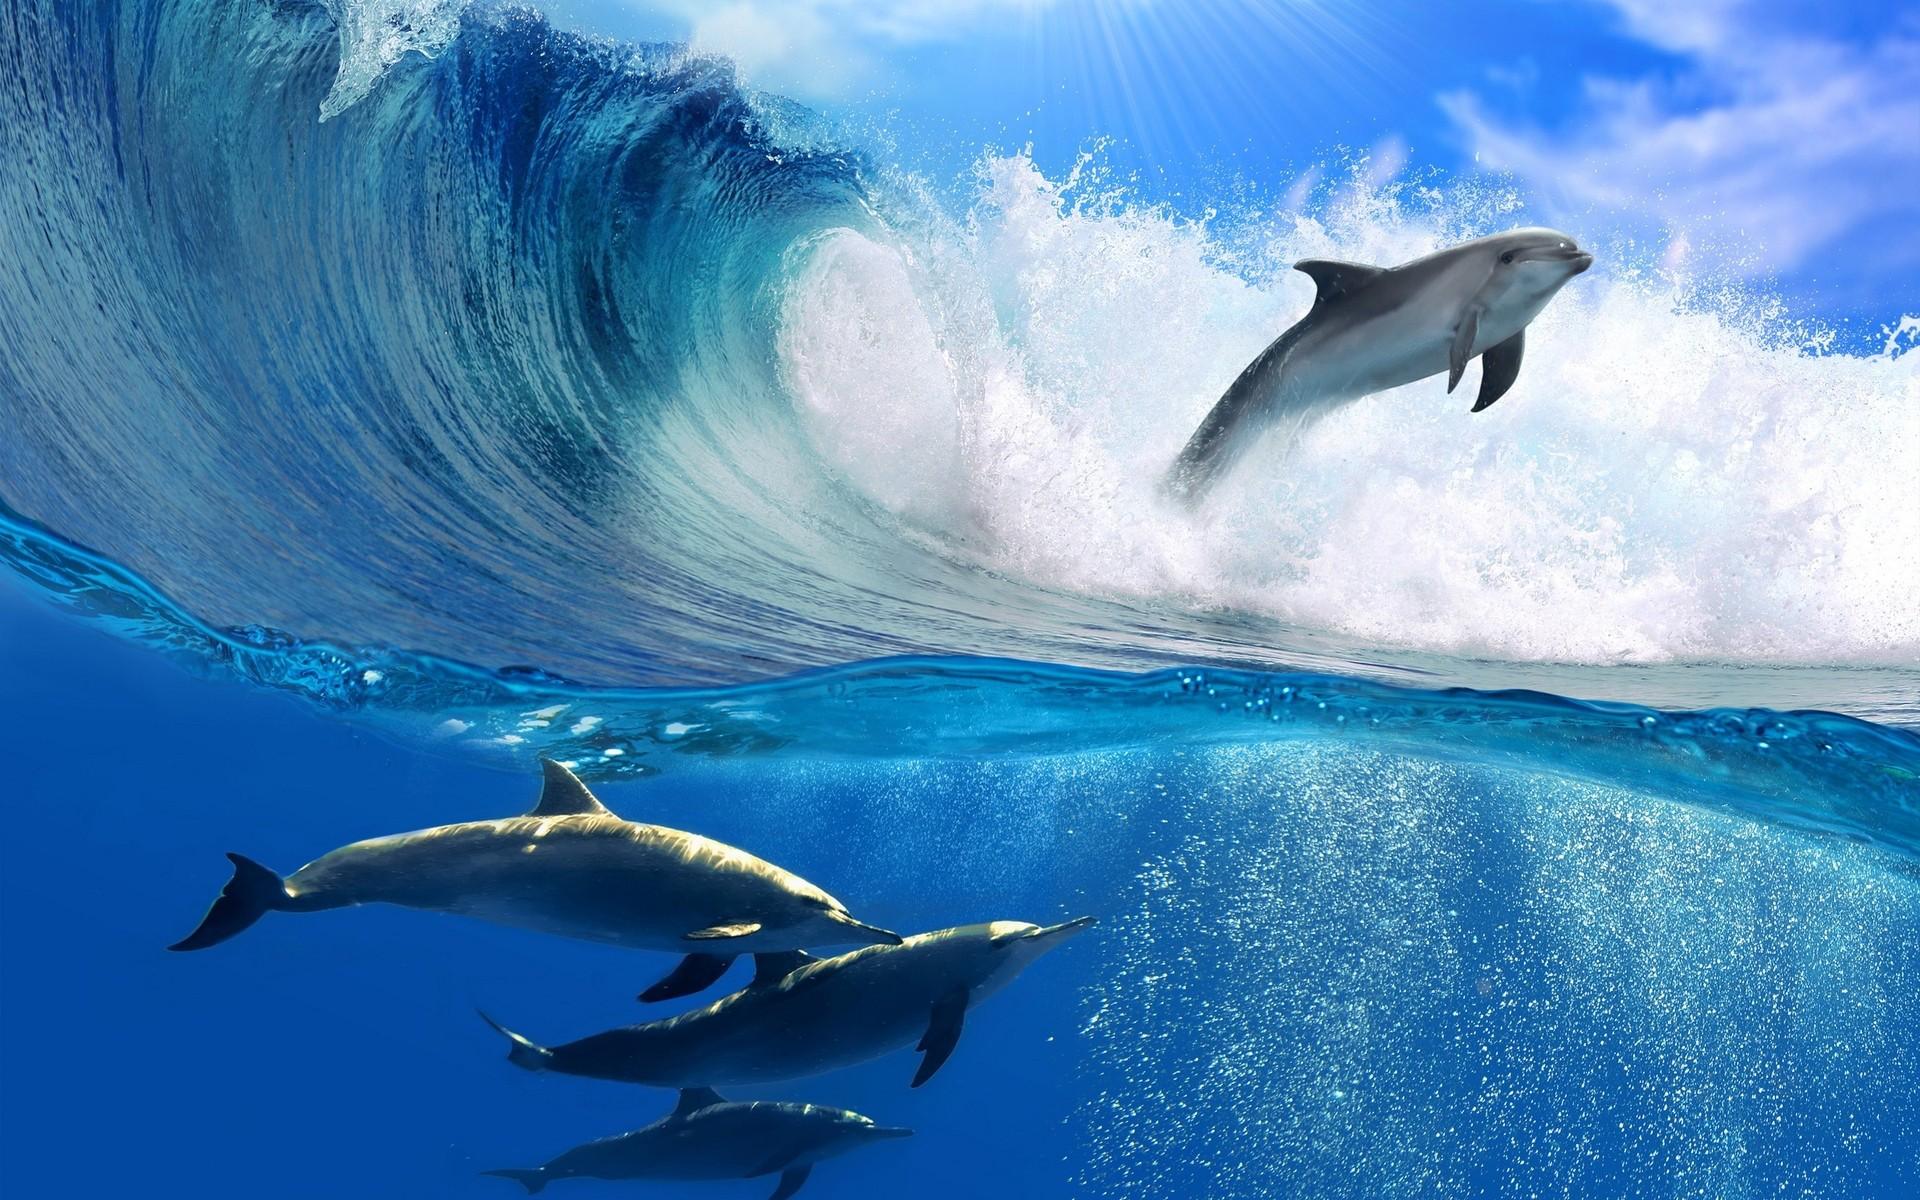 http://img.fonwall.ru/o/50/delfinyi_more_okean_voda_volnyi.jpg